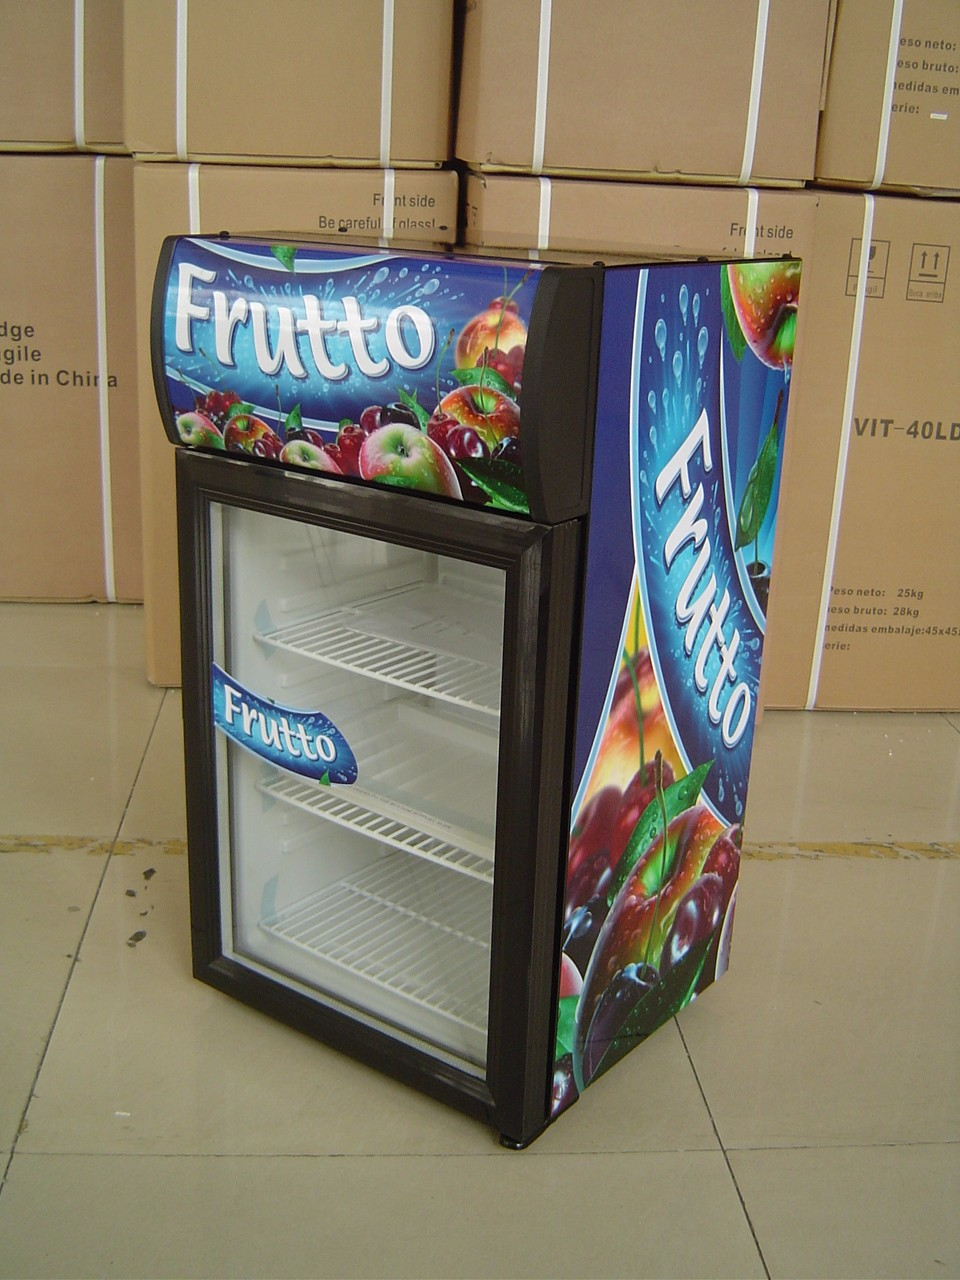 Commercial Upright Freezer With Glass Door Upright Ice Cream Freezer